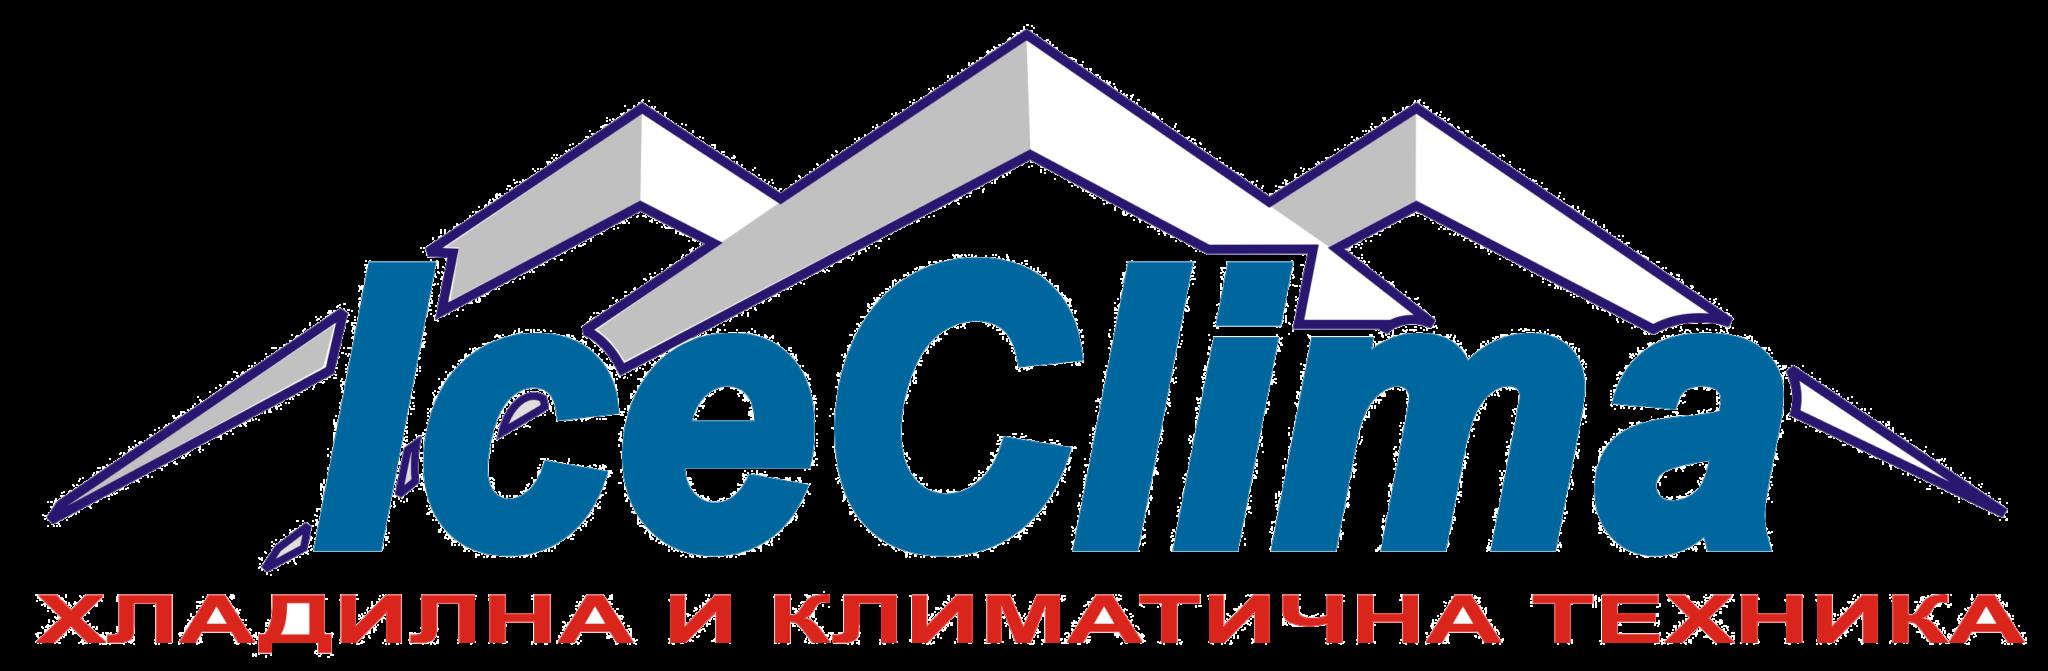 Iceclima